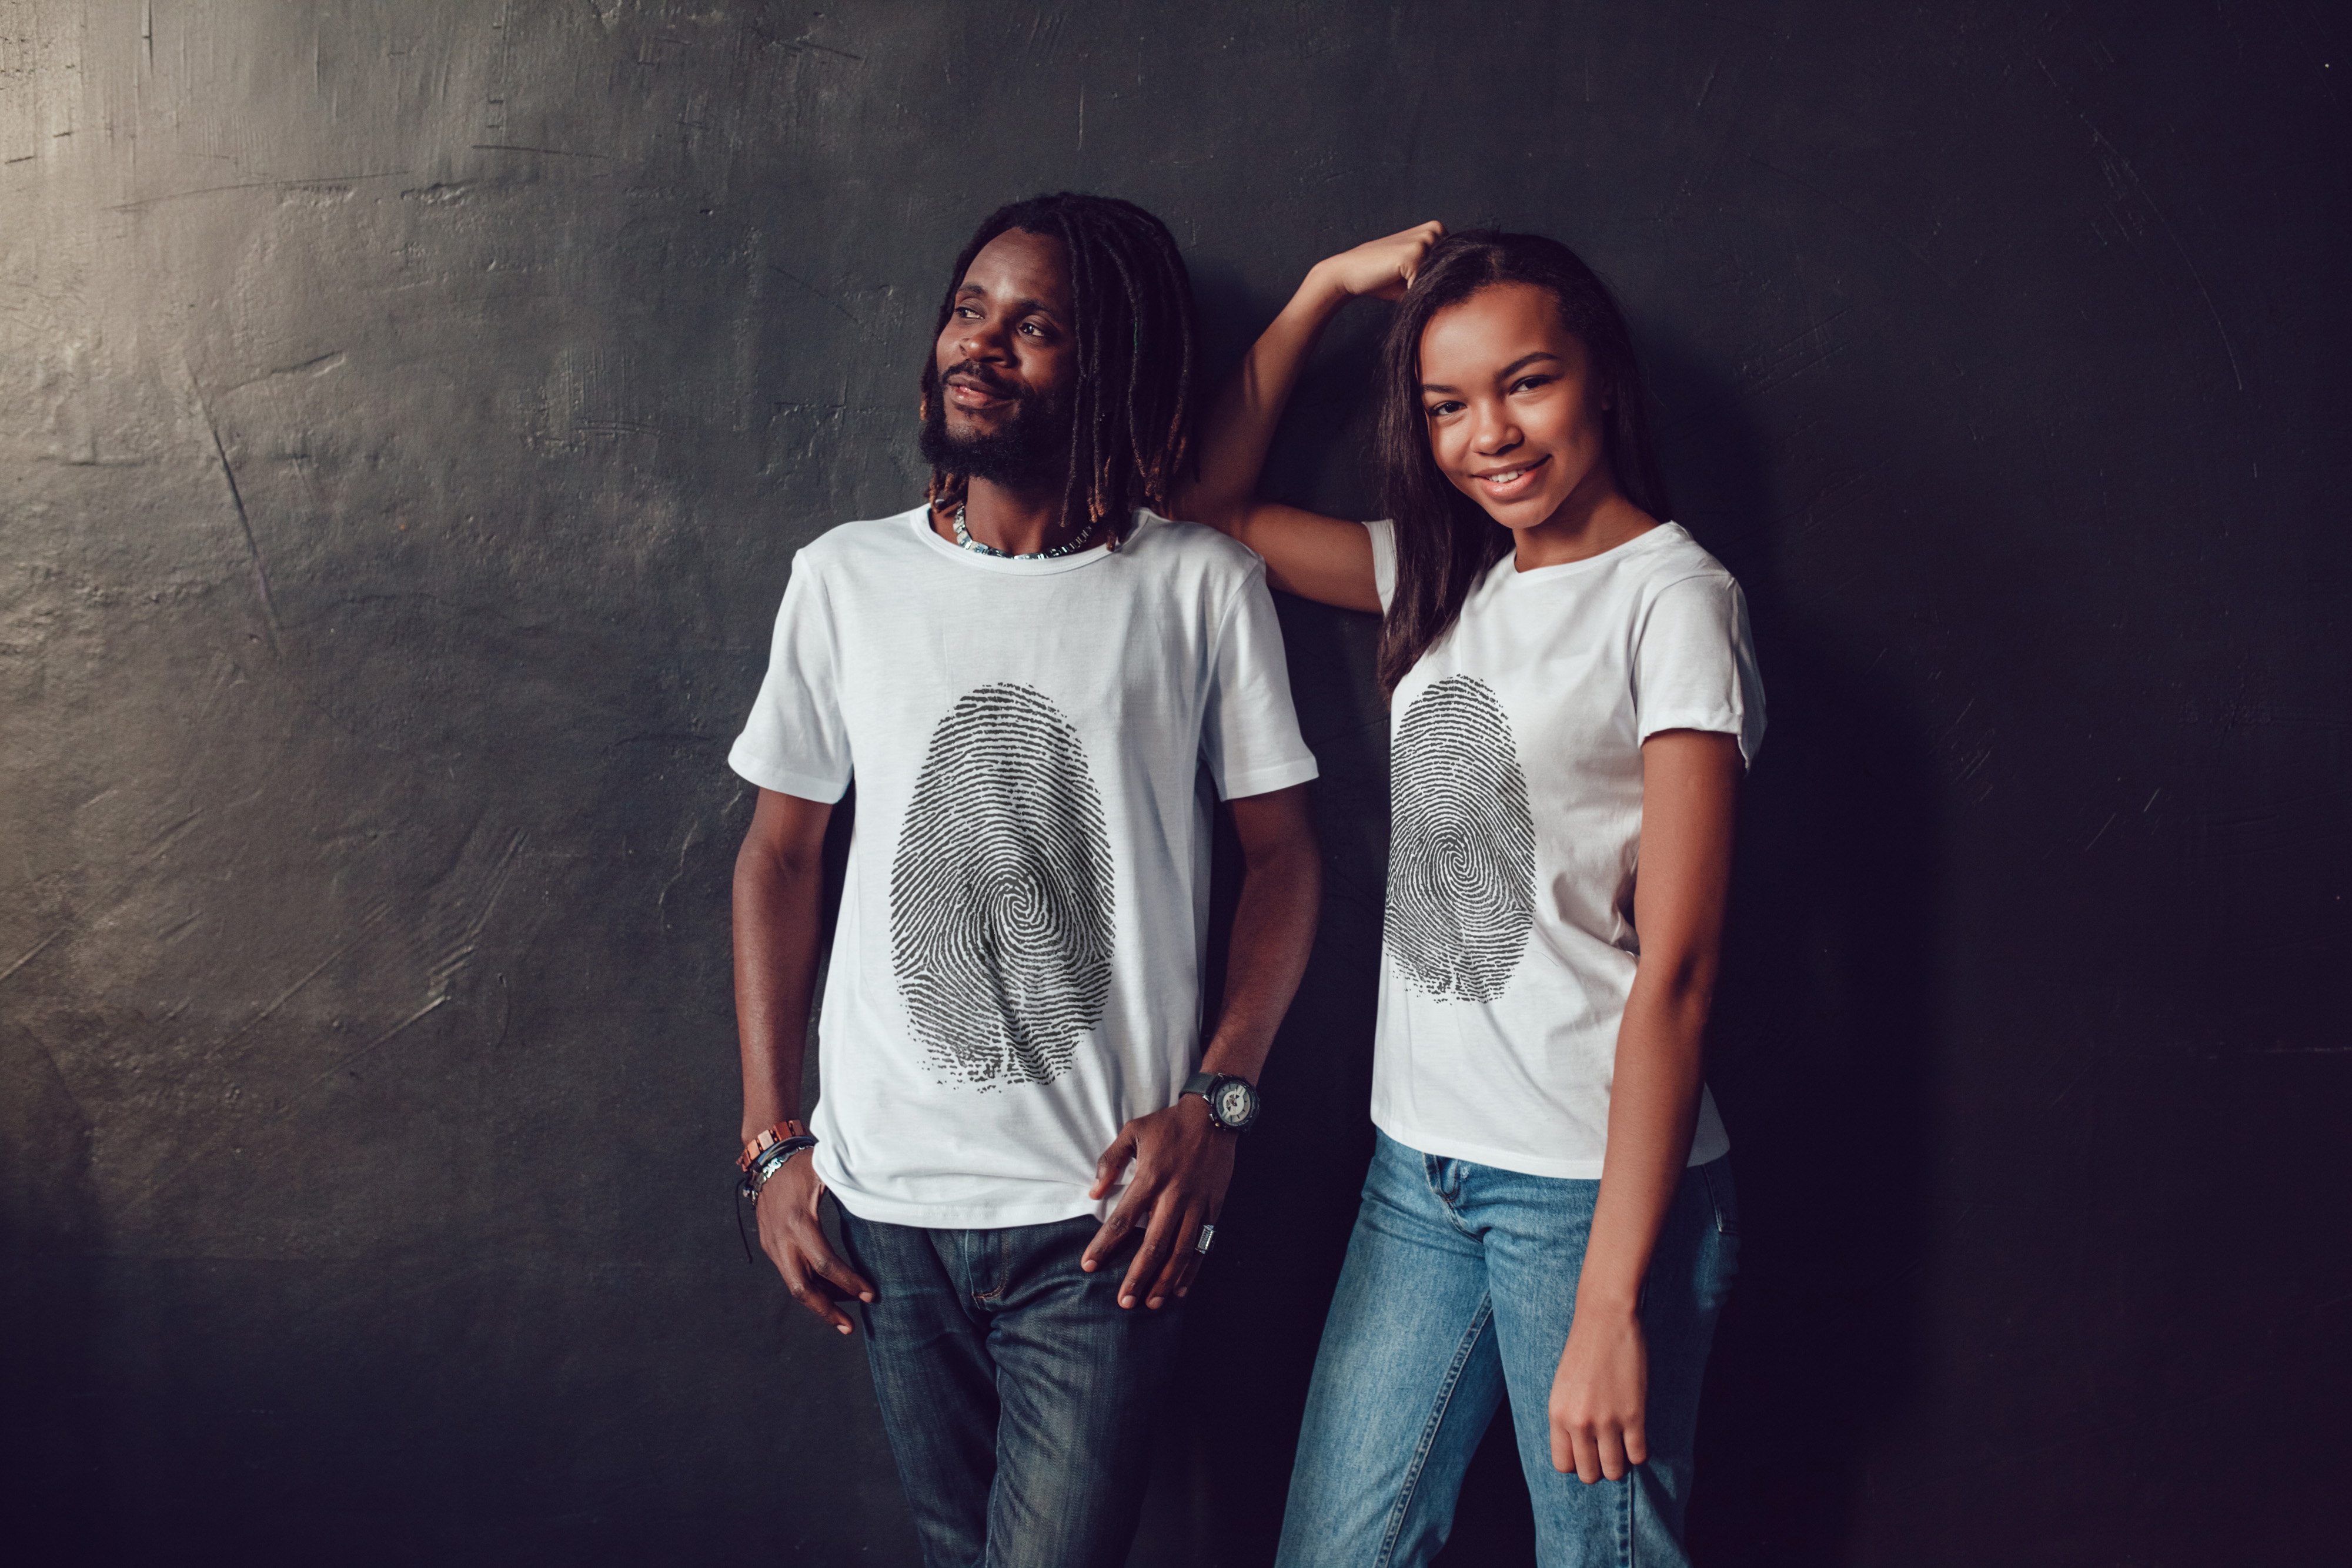 T-Shirt Mock-Up 2018 #1 example image 11